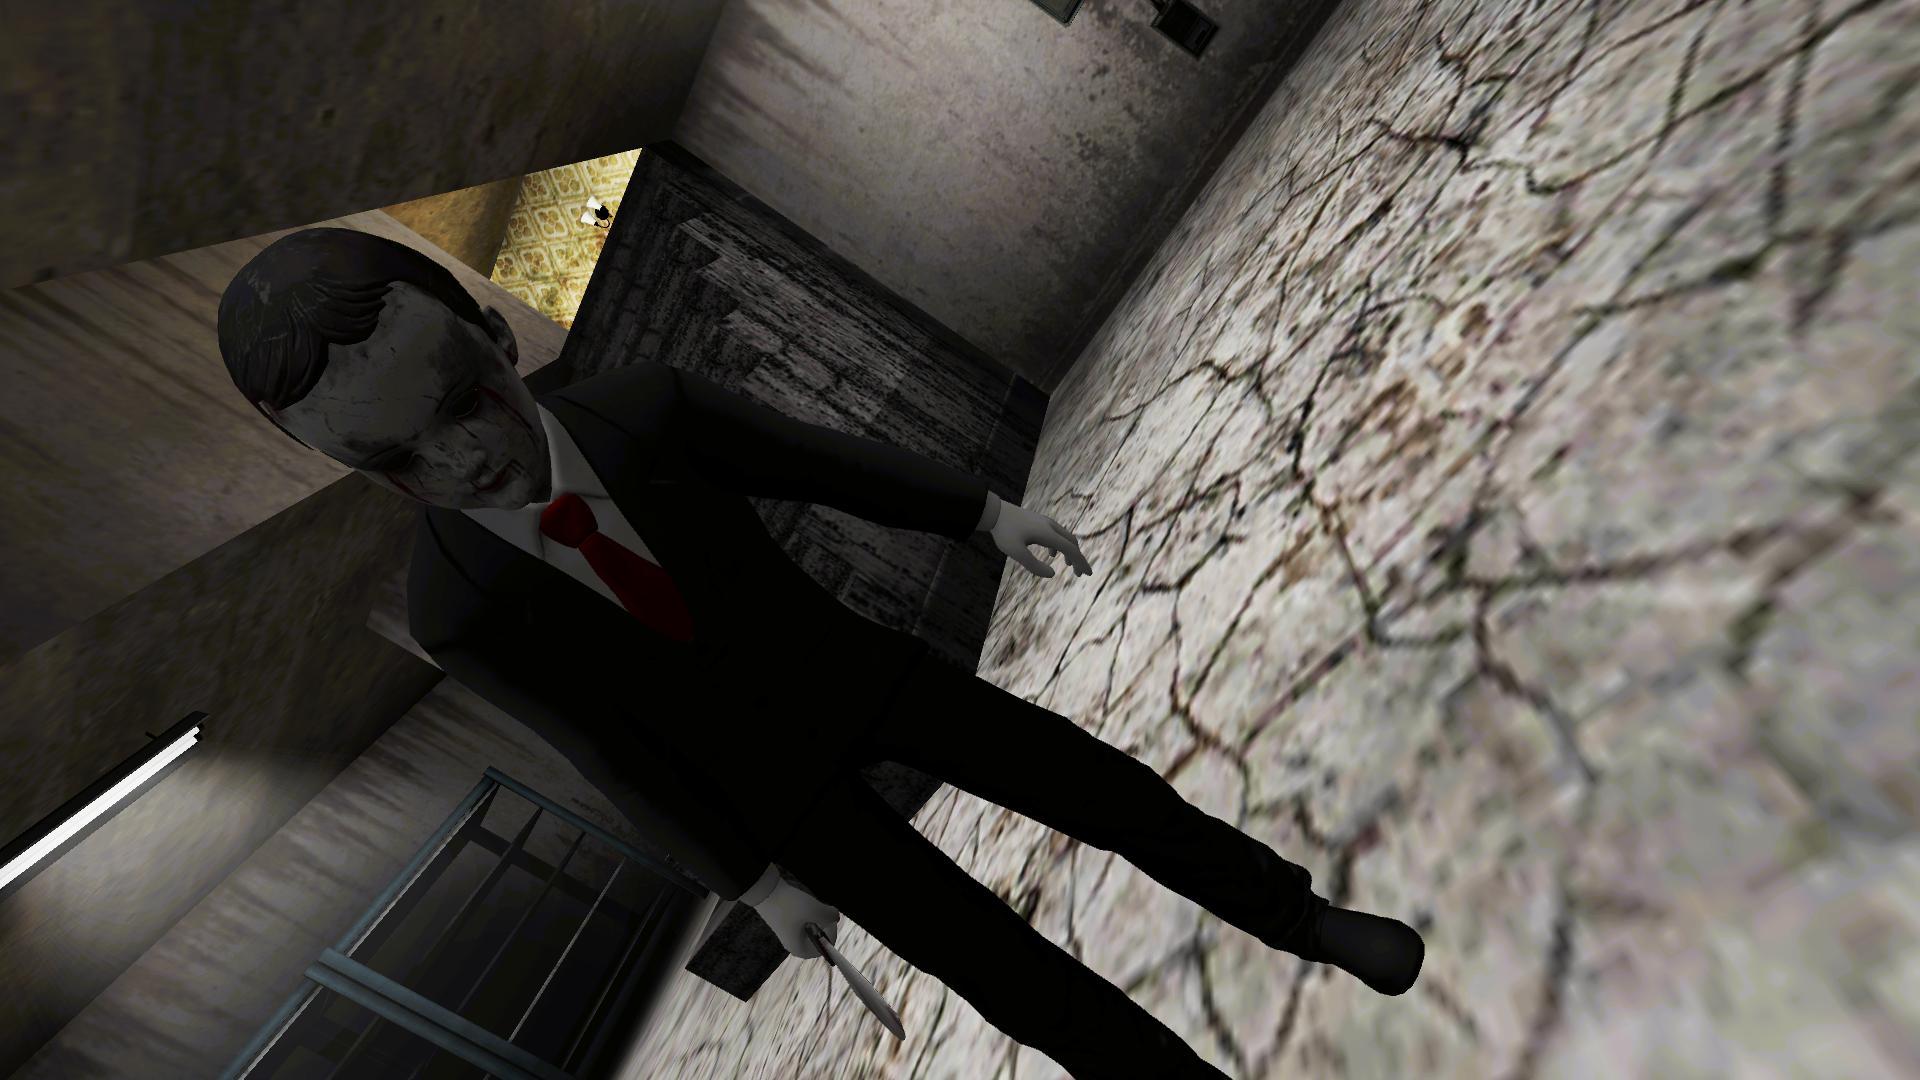 Evil Kid The Horror Game 1.1.9.5.4.4 Screenshot 1